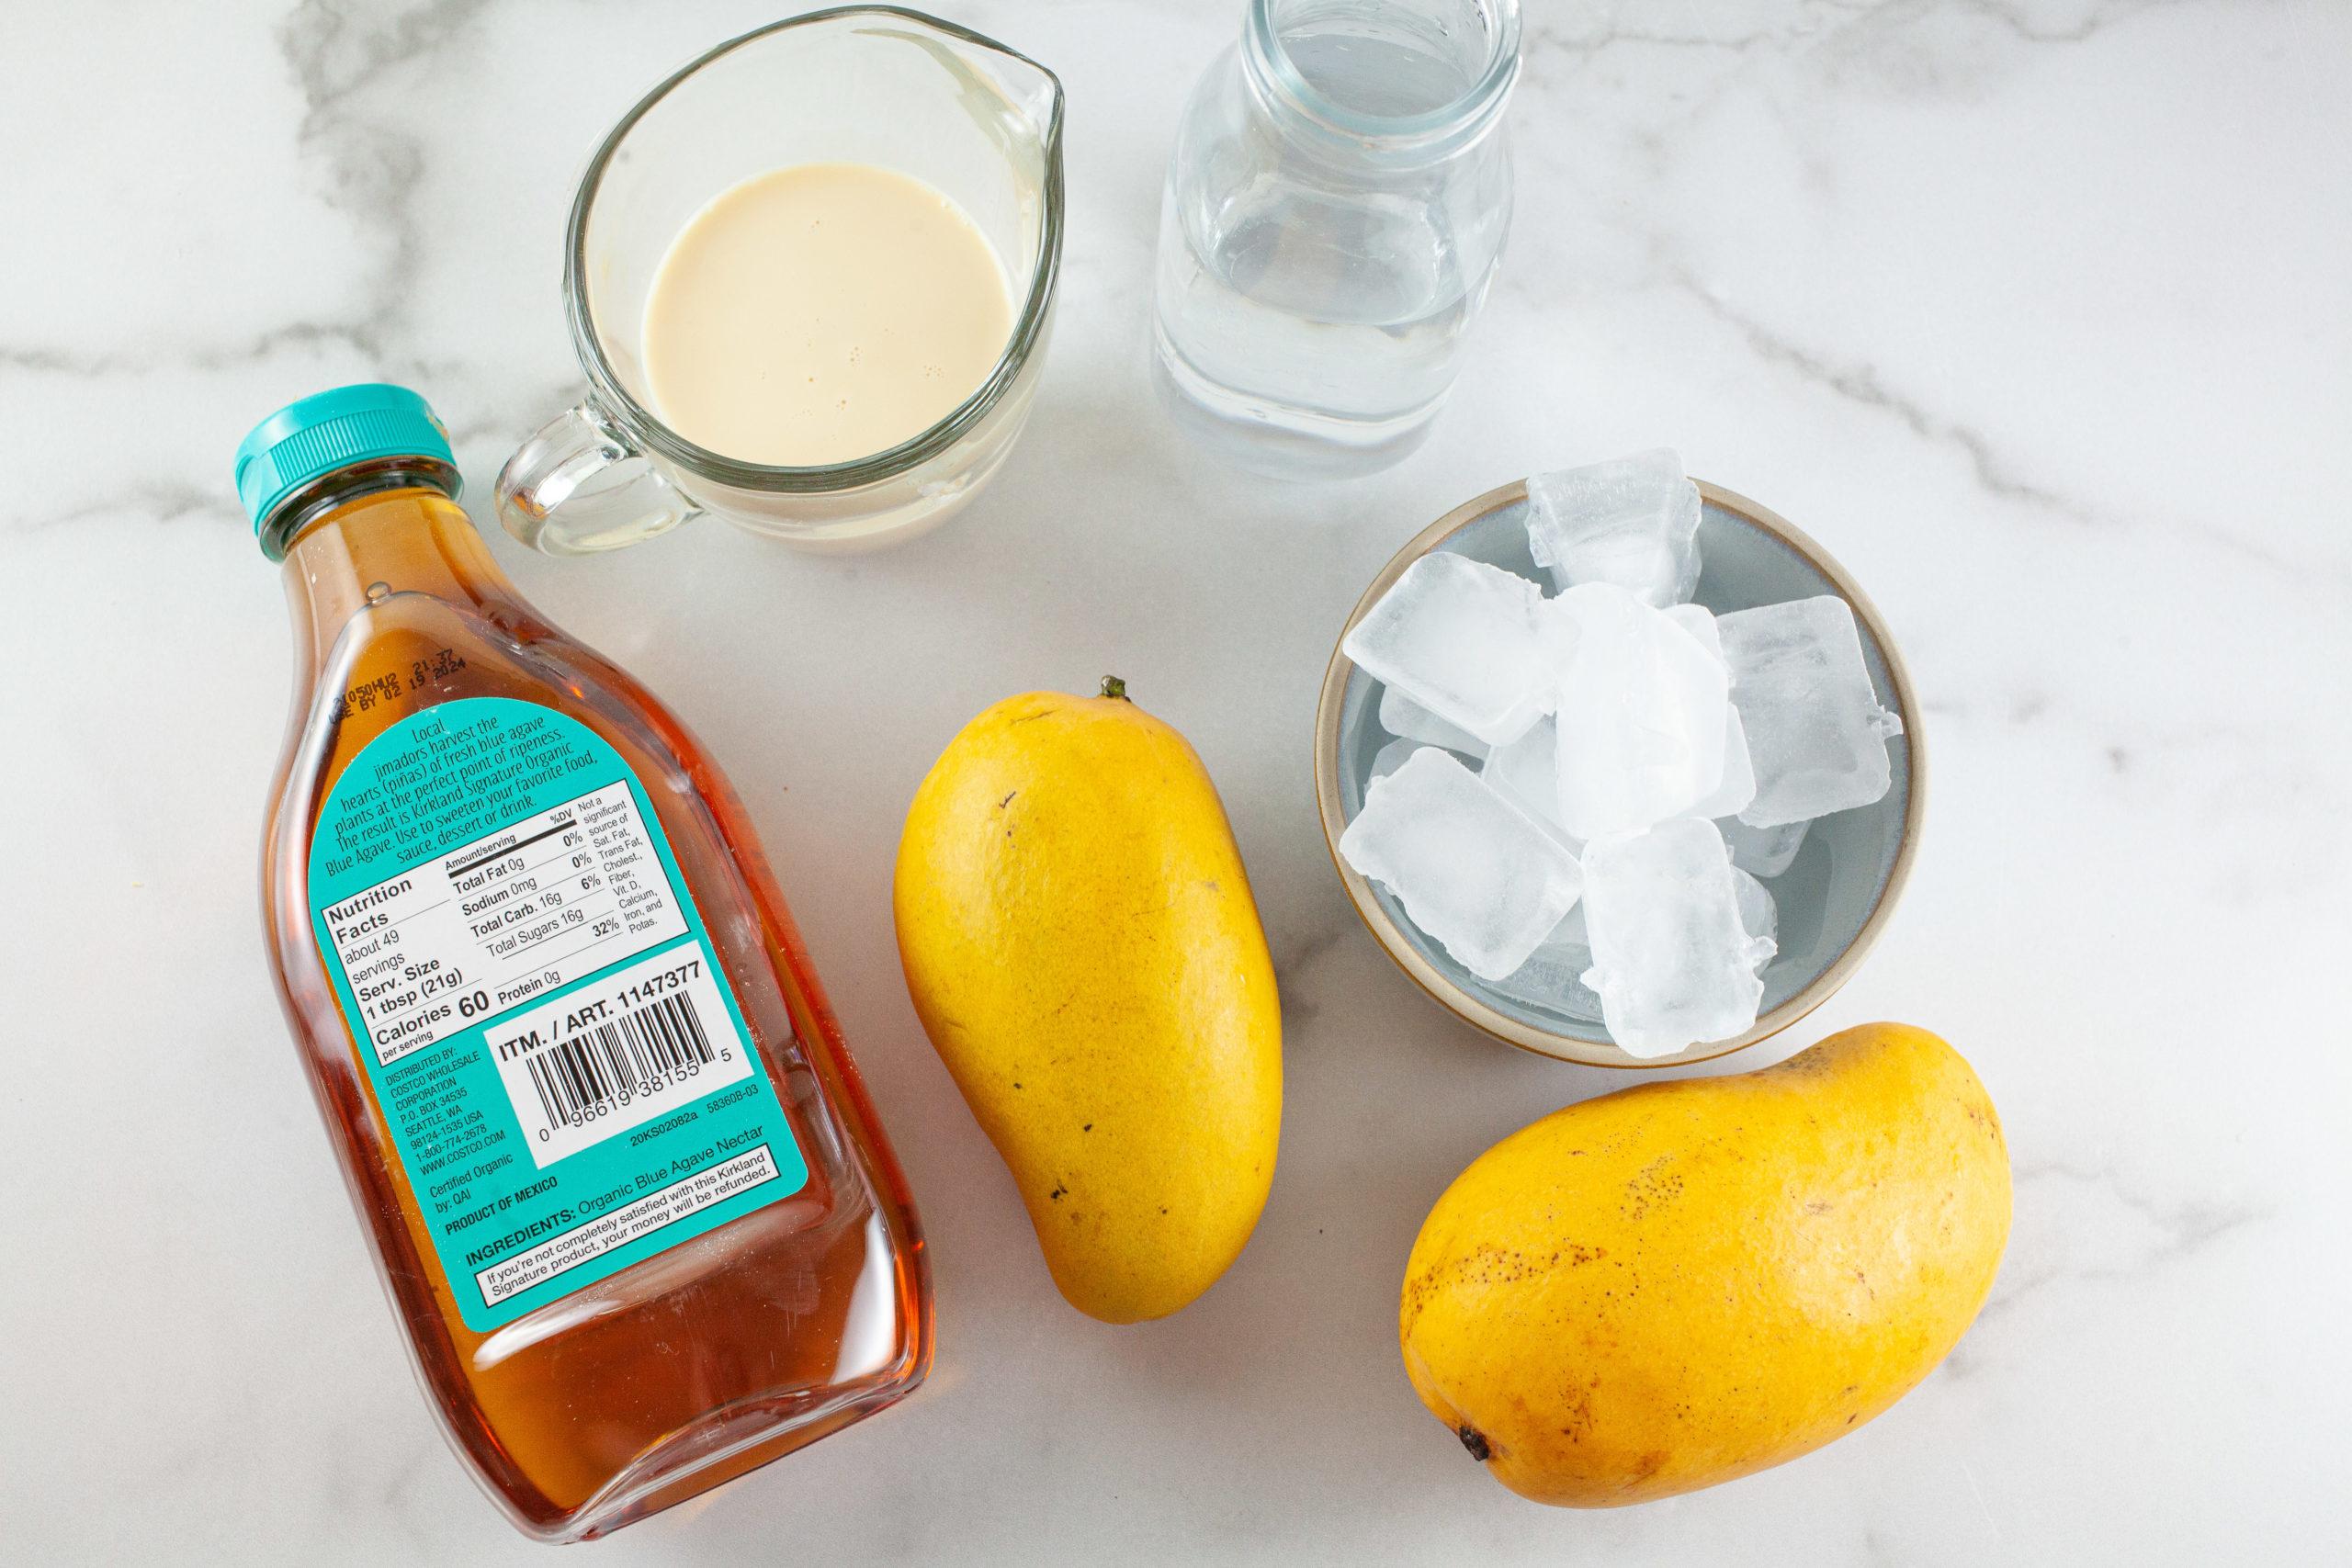 Ice, mangoes, agave nectar and cream.